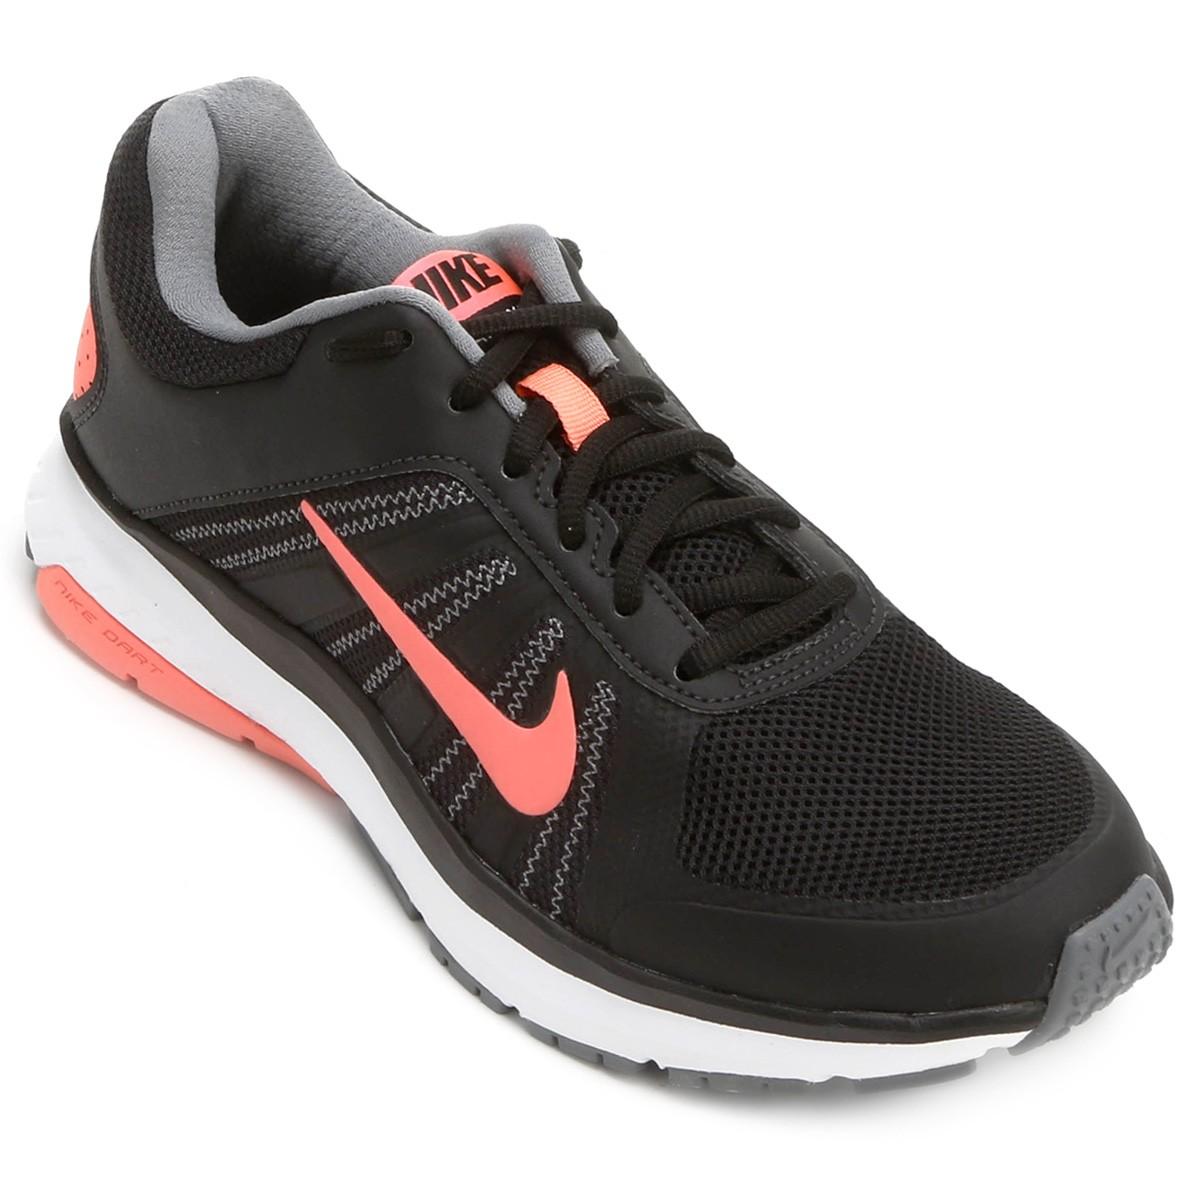 9190a750b Tênis Feminino Nike Wmns Dart 12 Msl 831539-003 Preto Salmão